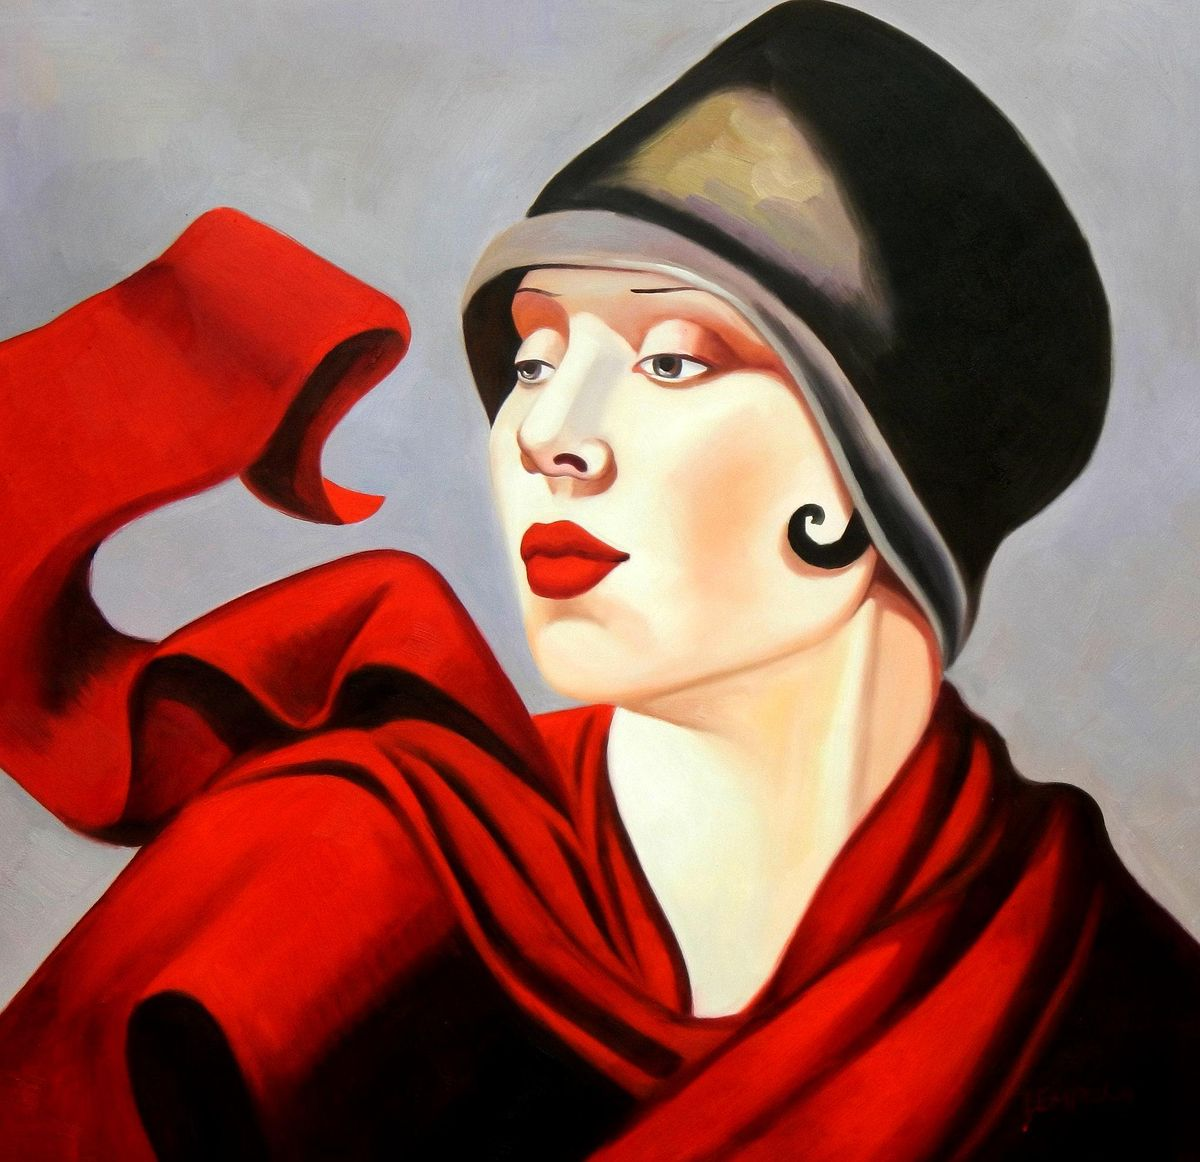 Homage of T. de Lempicka - Frau mit rotem Schal g94652 80x80cm exzellentes Ölbild